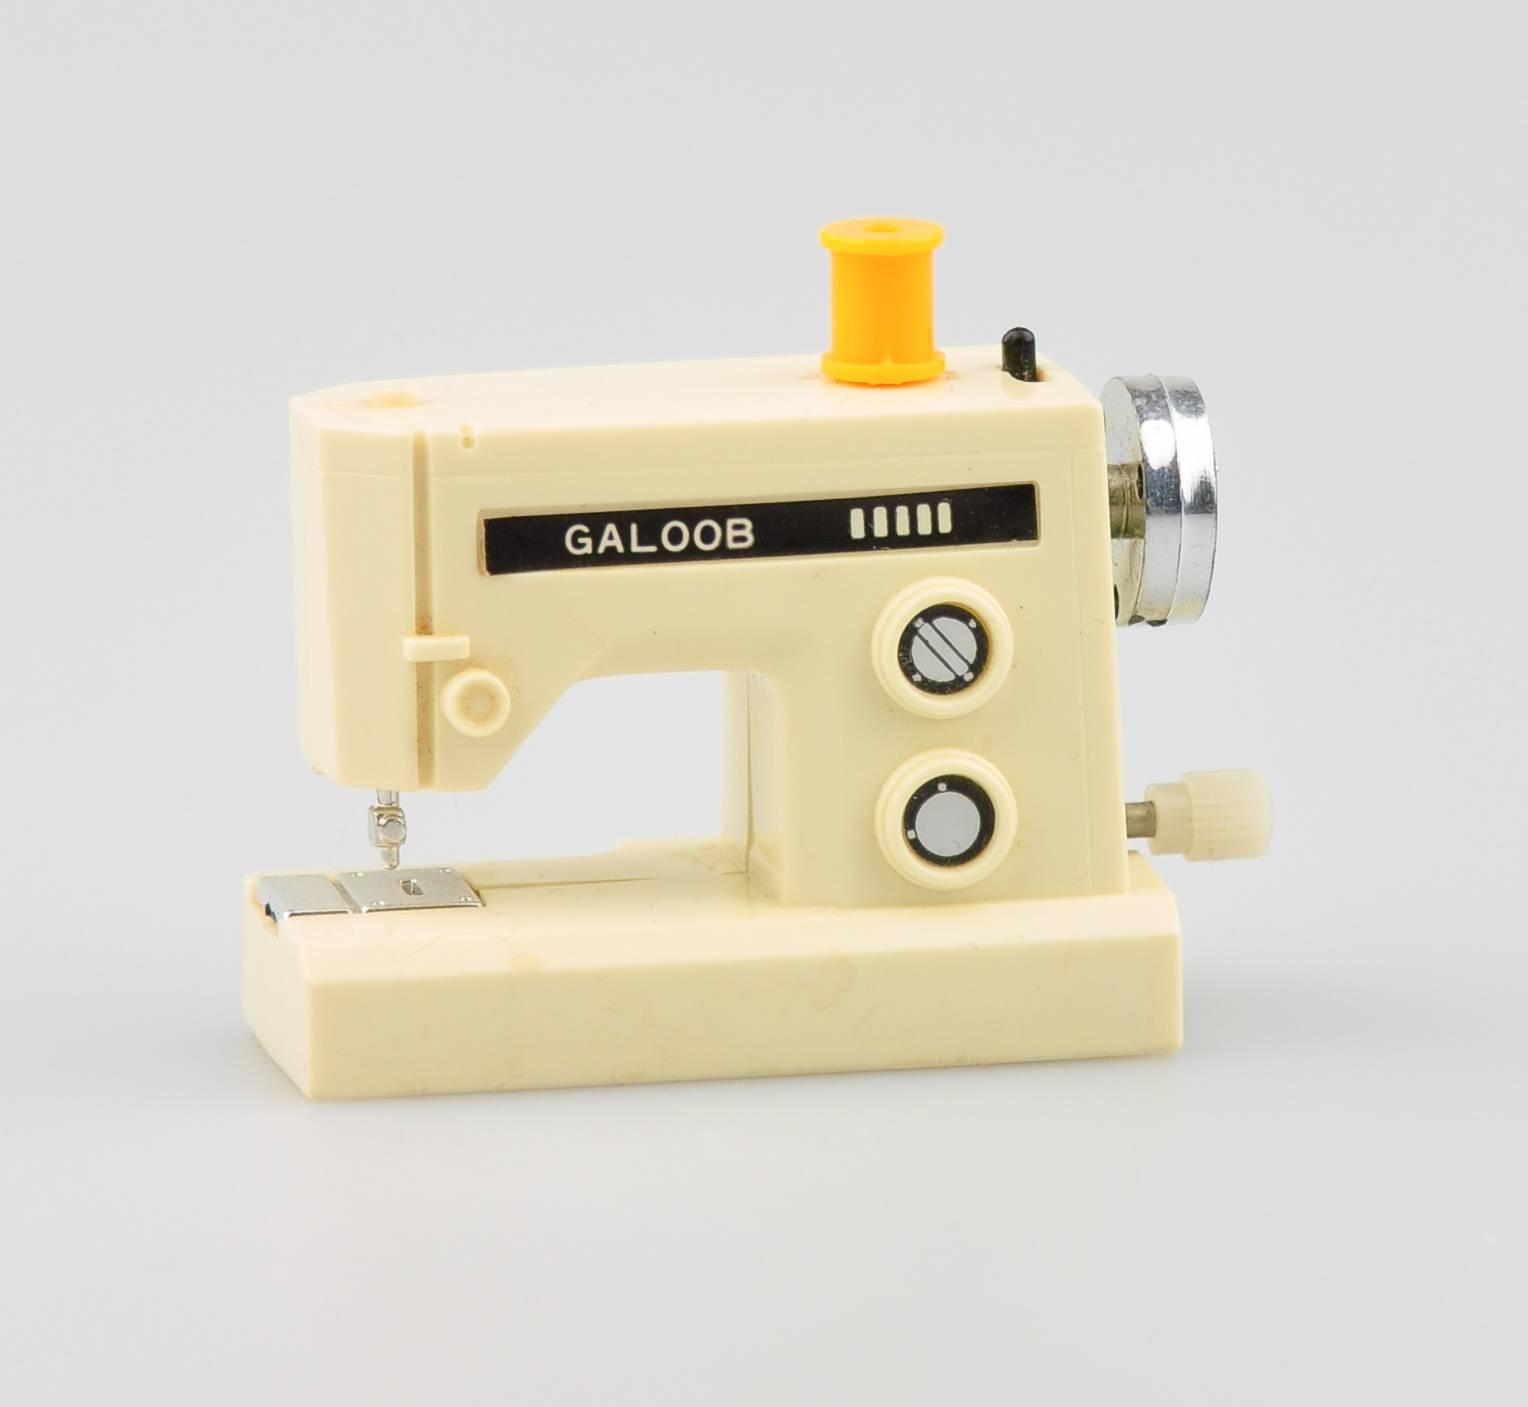 Working Wonders - Sewing Machine